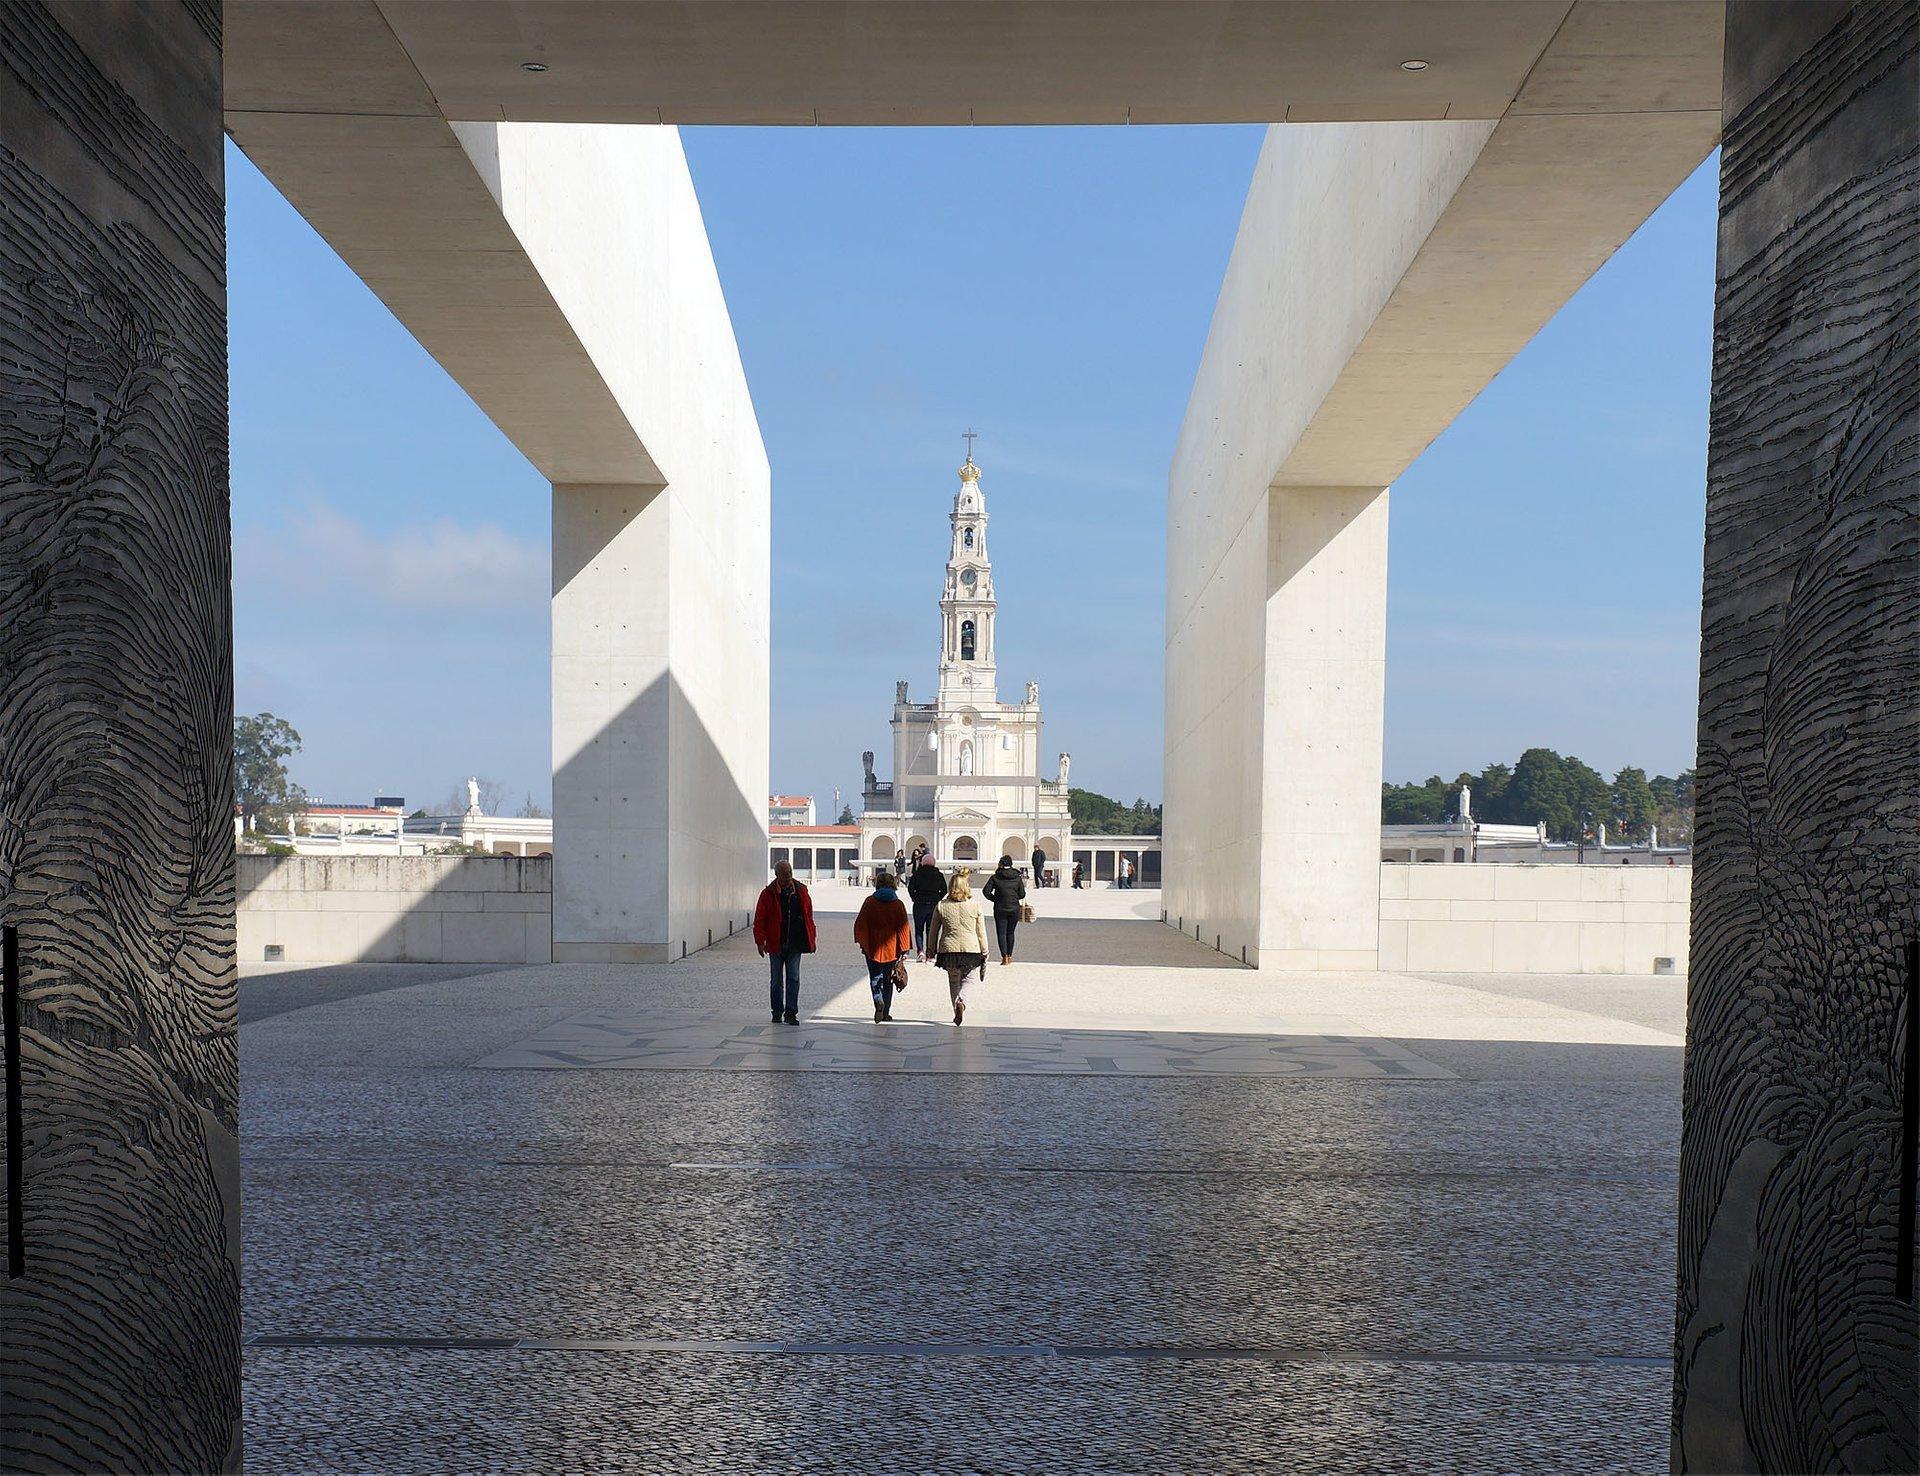 Fatima Pilgrimage in Portugal - Best Season 2020